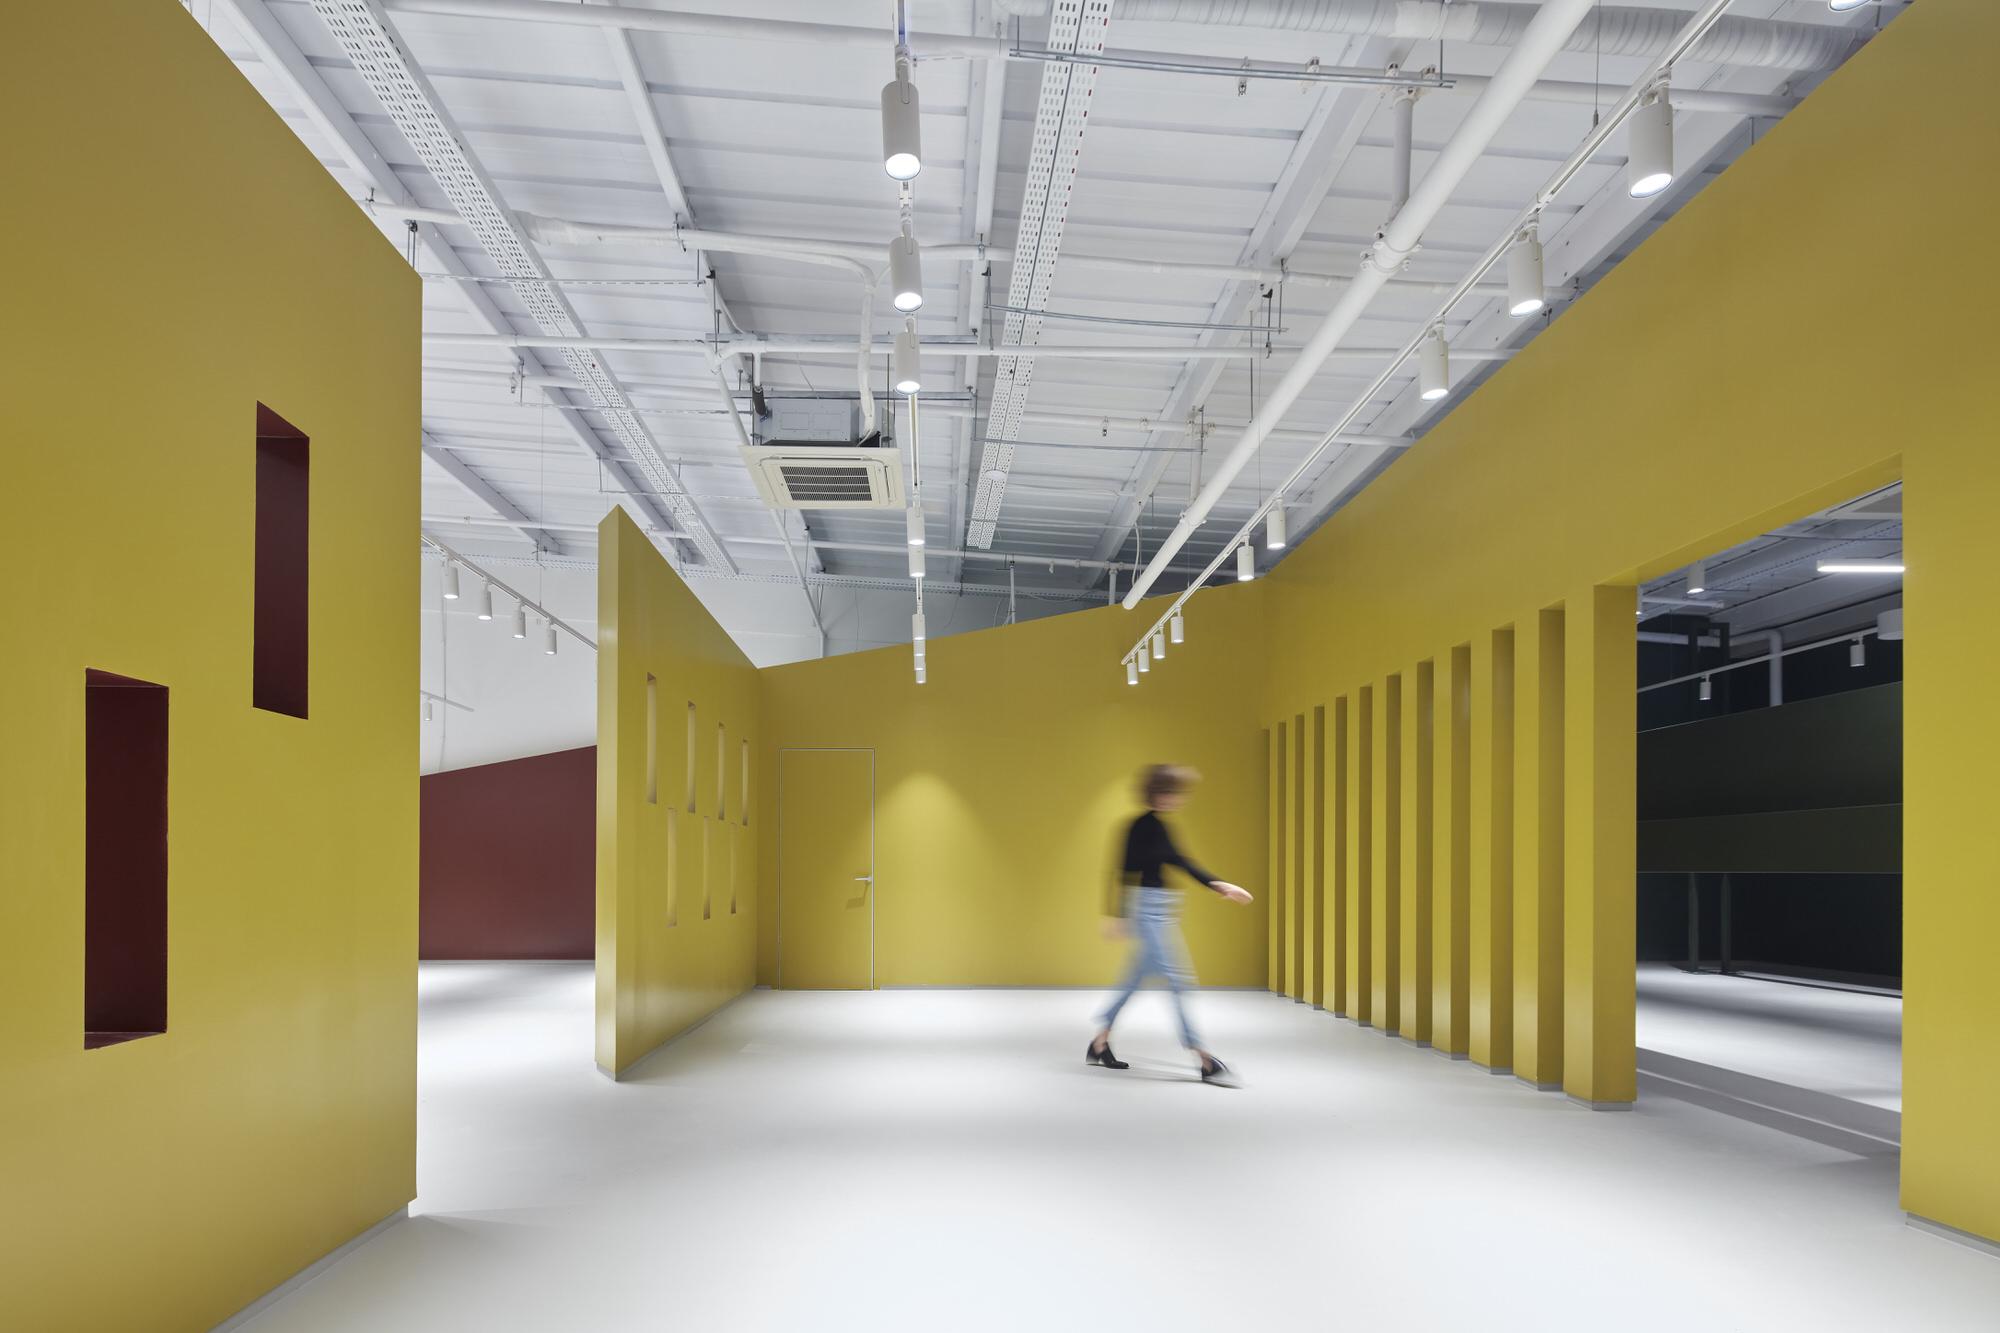 Baranowitz Goldberg Kaza Israel Showroom Interior Design Photo Shai Gil Yellowtrace 26